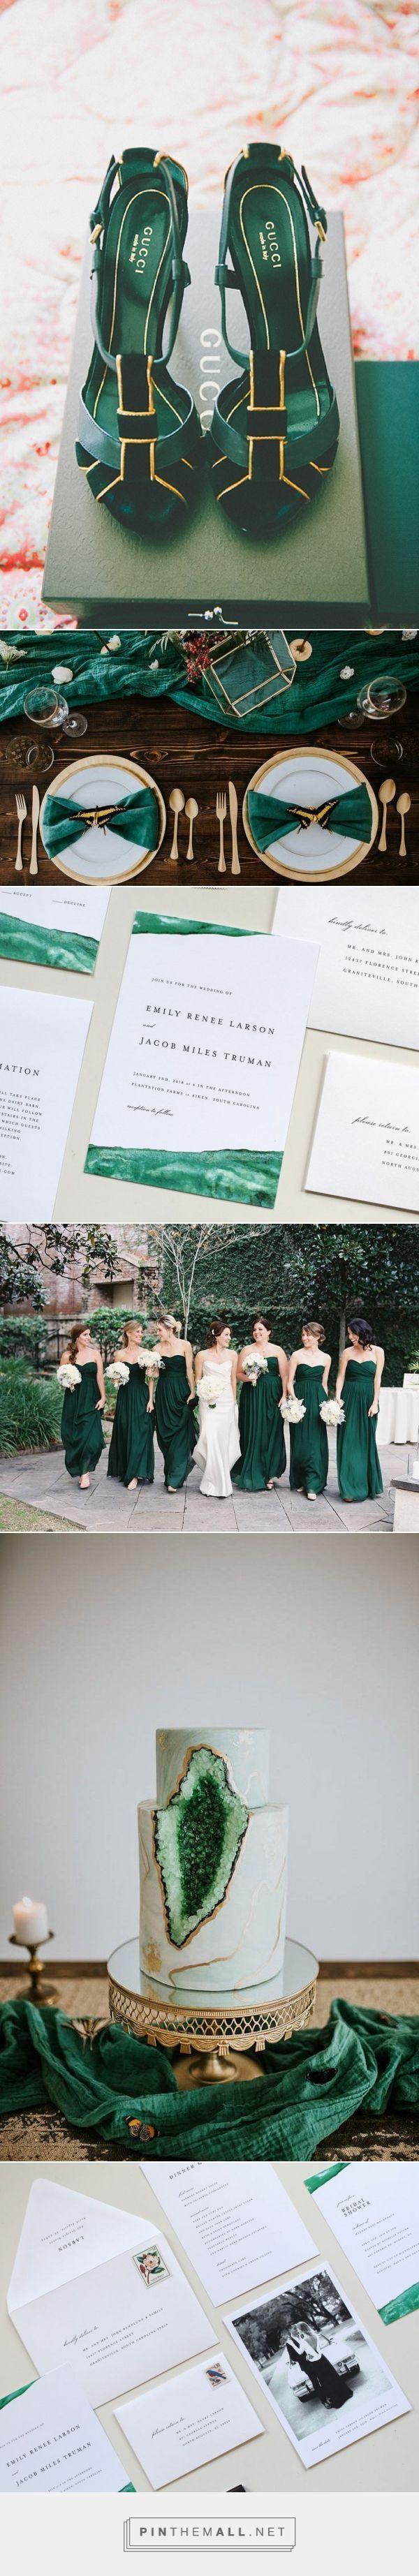 afternoon tewedding theme ideas%0A Emerald Wedding Invitation  Green Wedding Invites  Modern Emerald  Simple  Modern  Green Wedding Theme  Emerald Wedding Theme